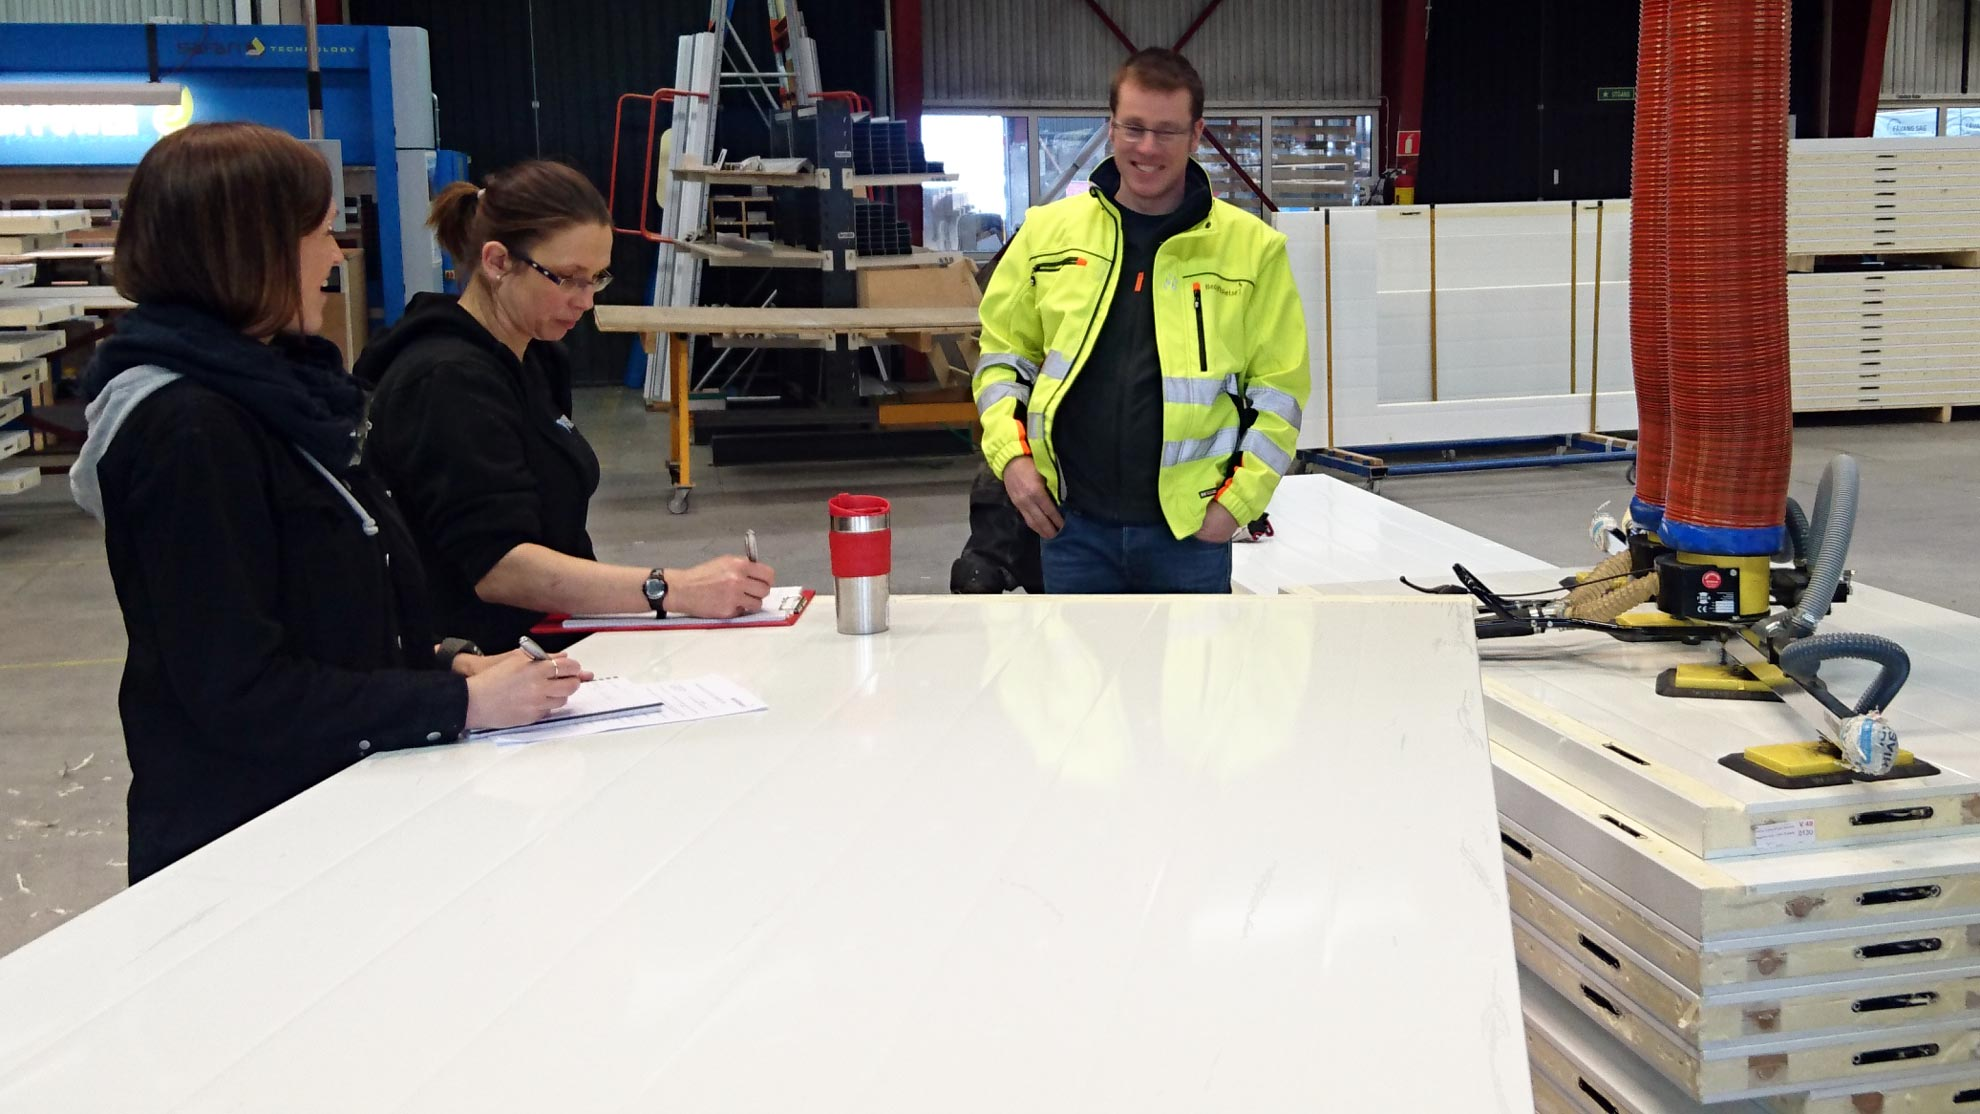 Foto: Johannes Gunvordal frå Bedriftshelse1 på vernerunde hos Fresvik Produkt.